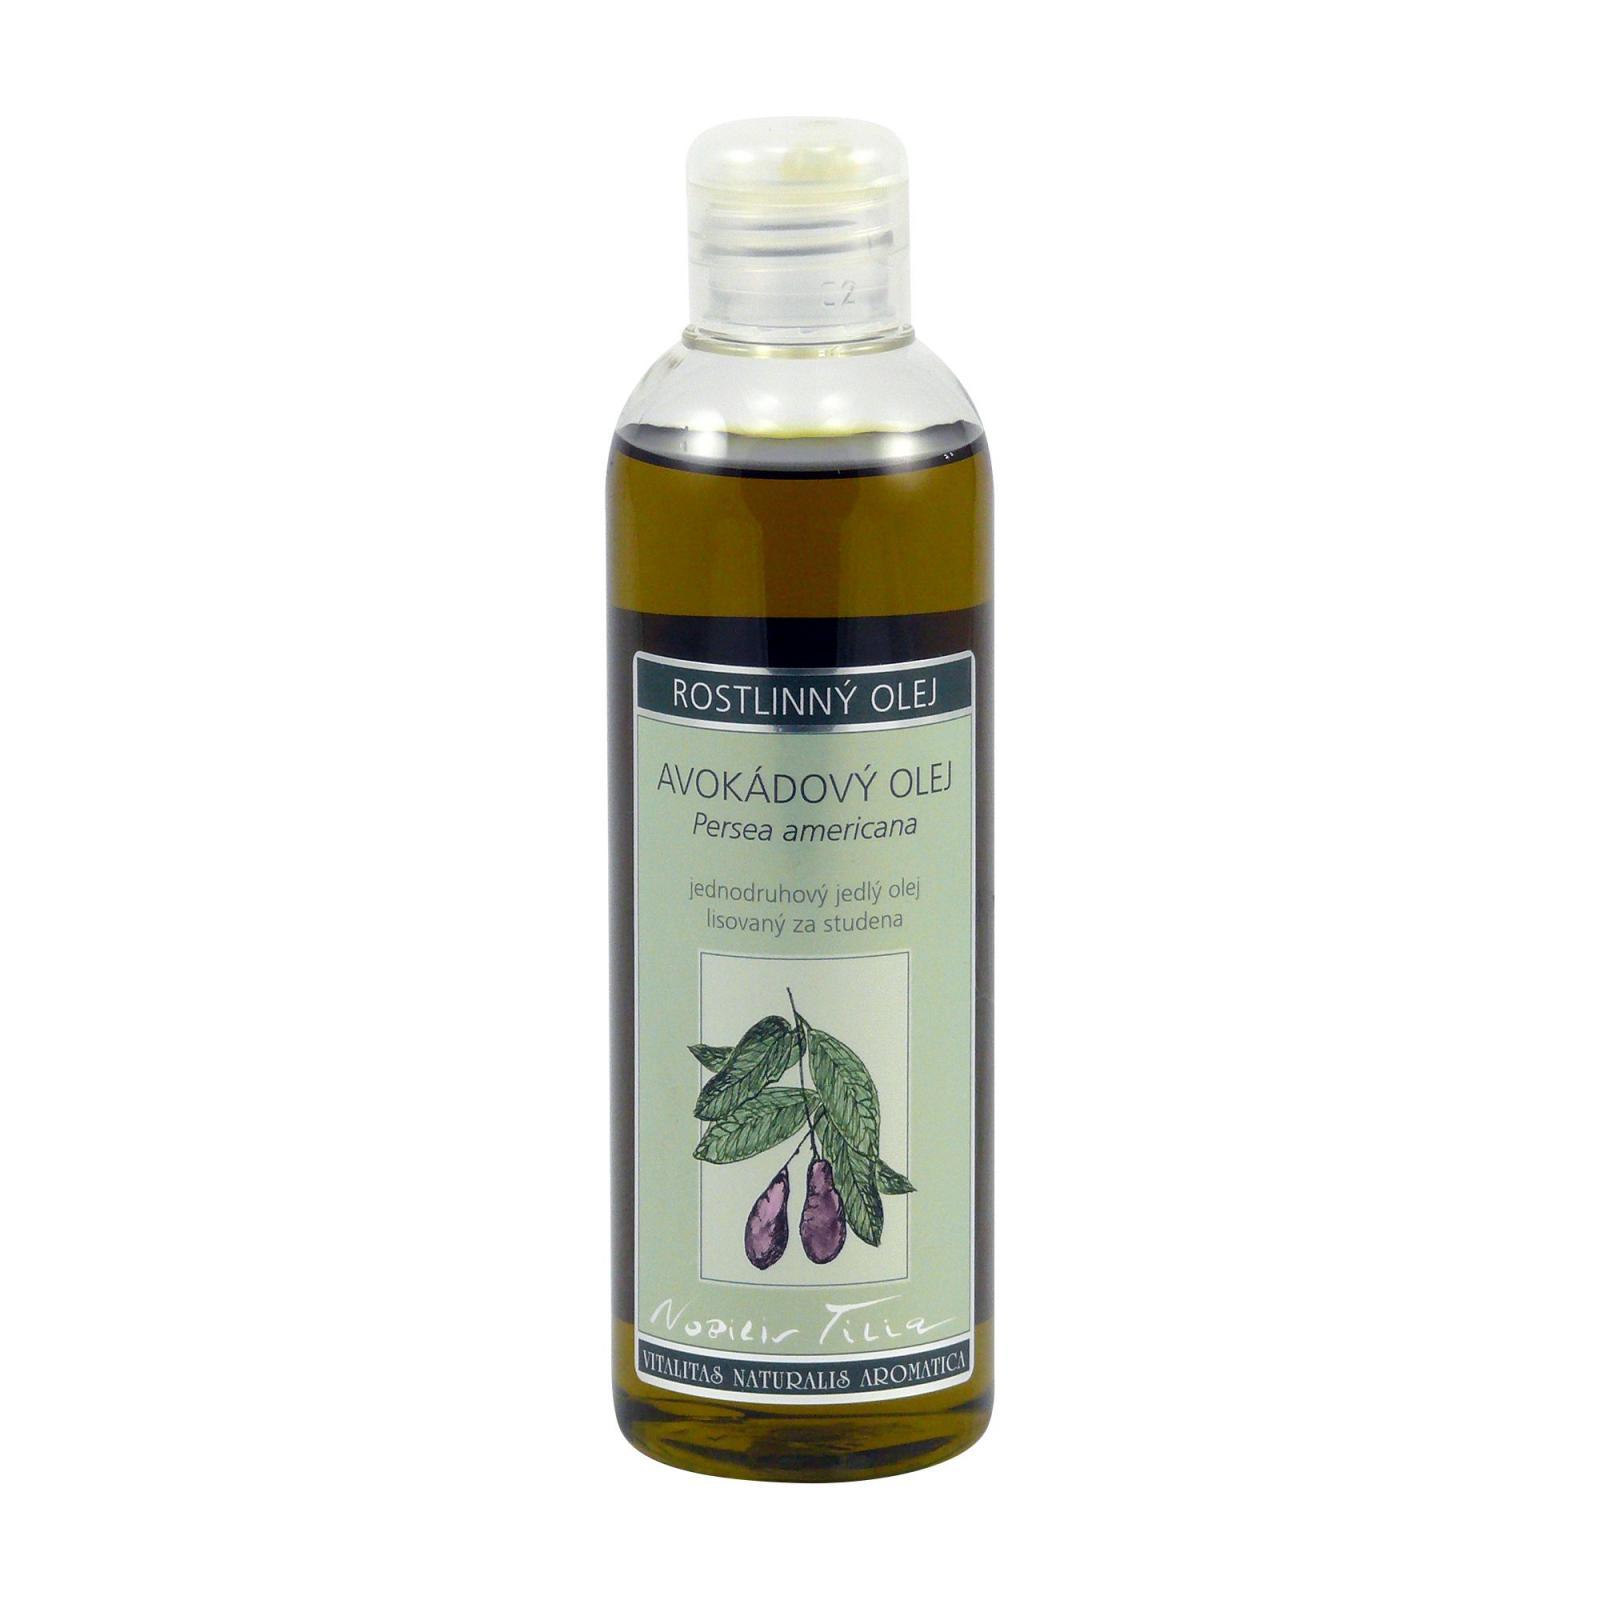 Nobilis Tilia Avokádový olej 200 ml